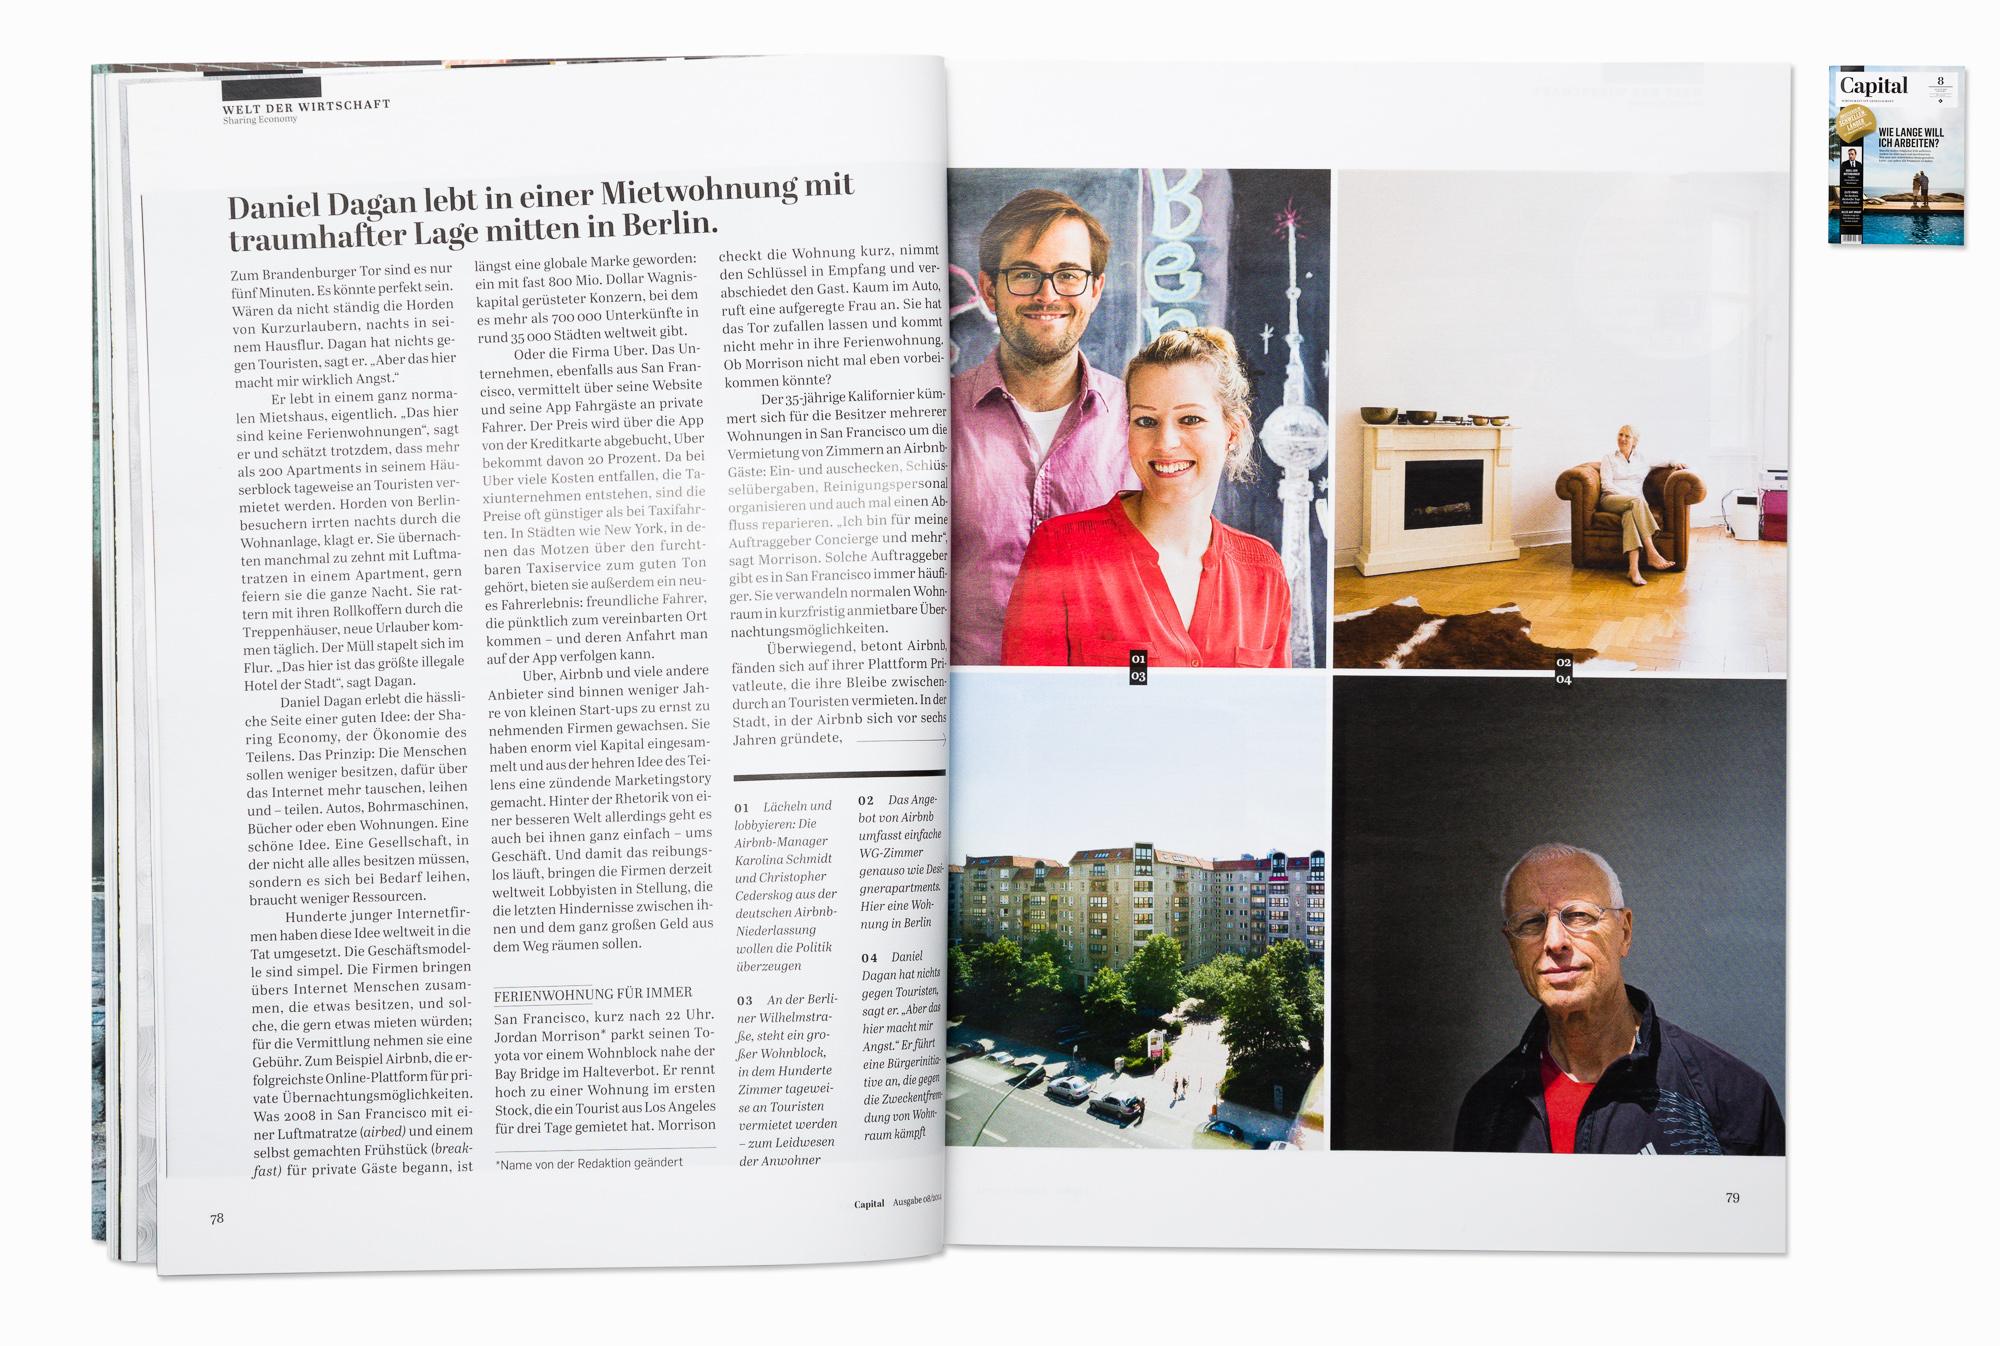 """Sharing economy"" story, for Capital magazine, Berlin 2014"